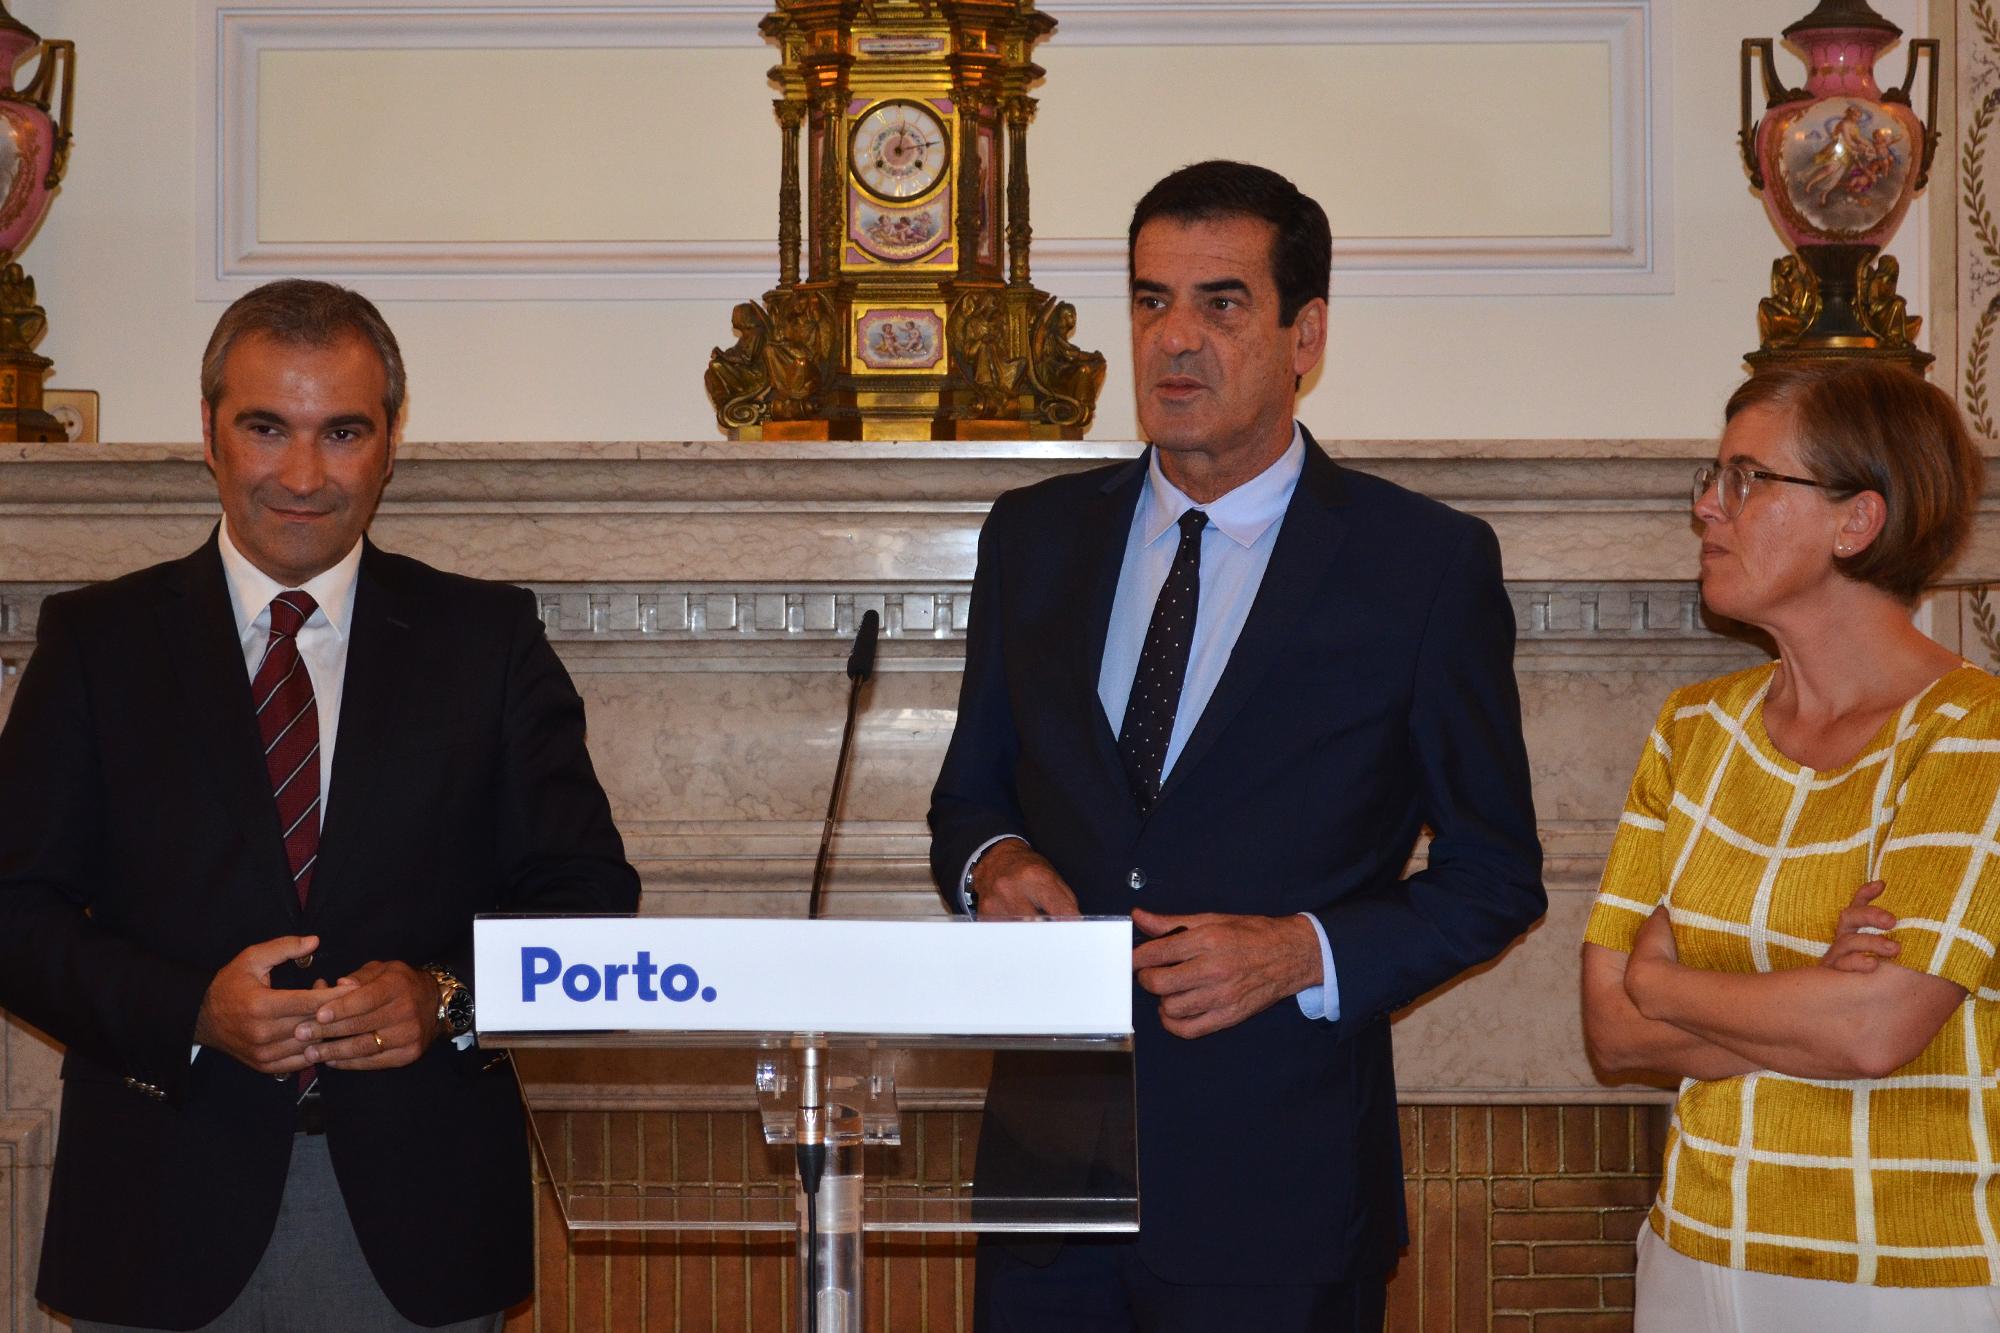 Manuel Paulo Teixeira, Rui Moreira e Cristina Pimentel